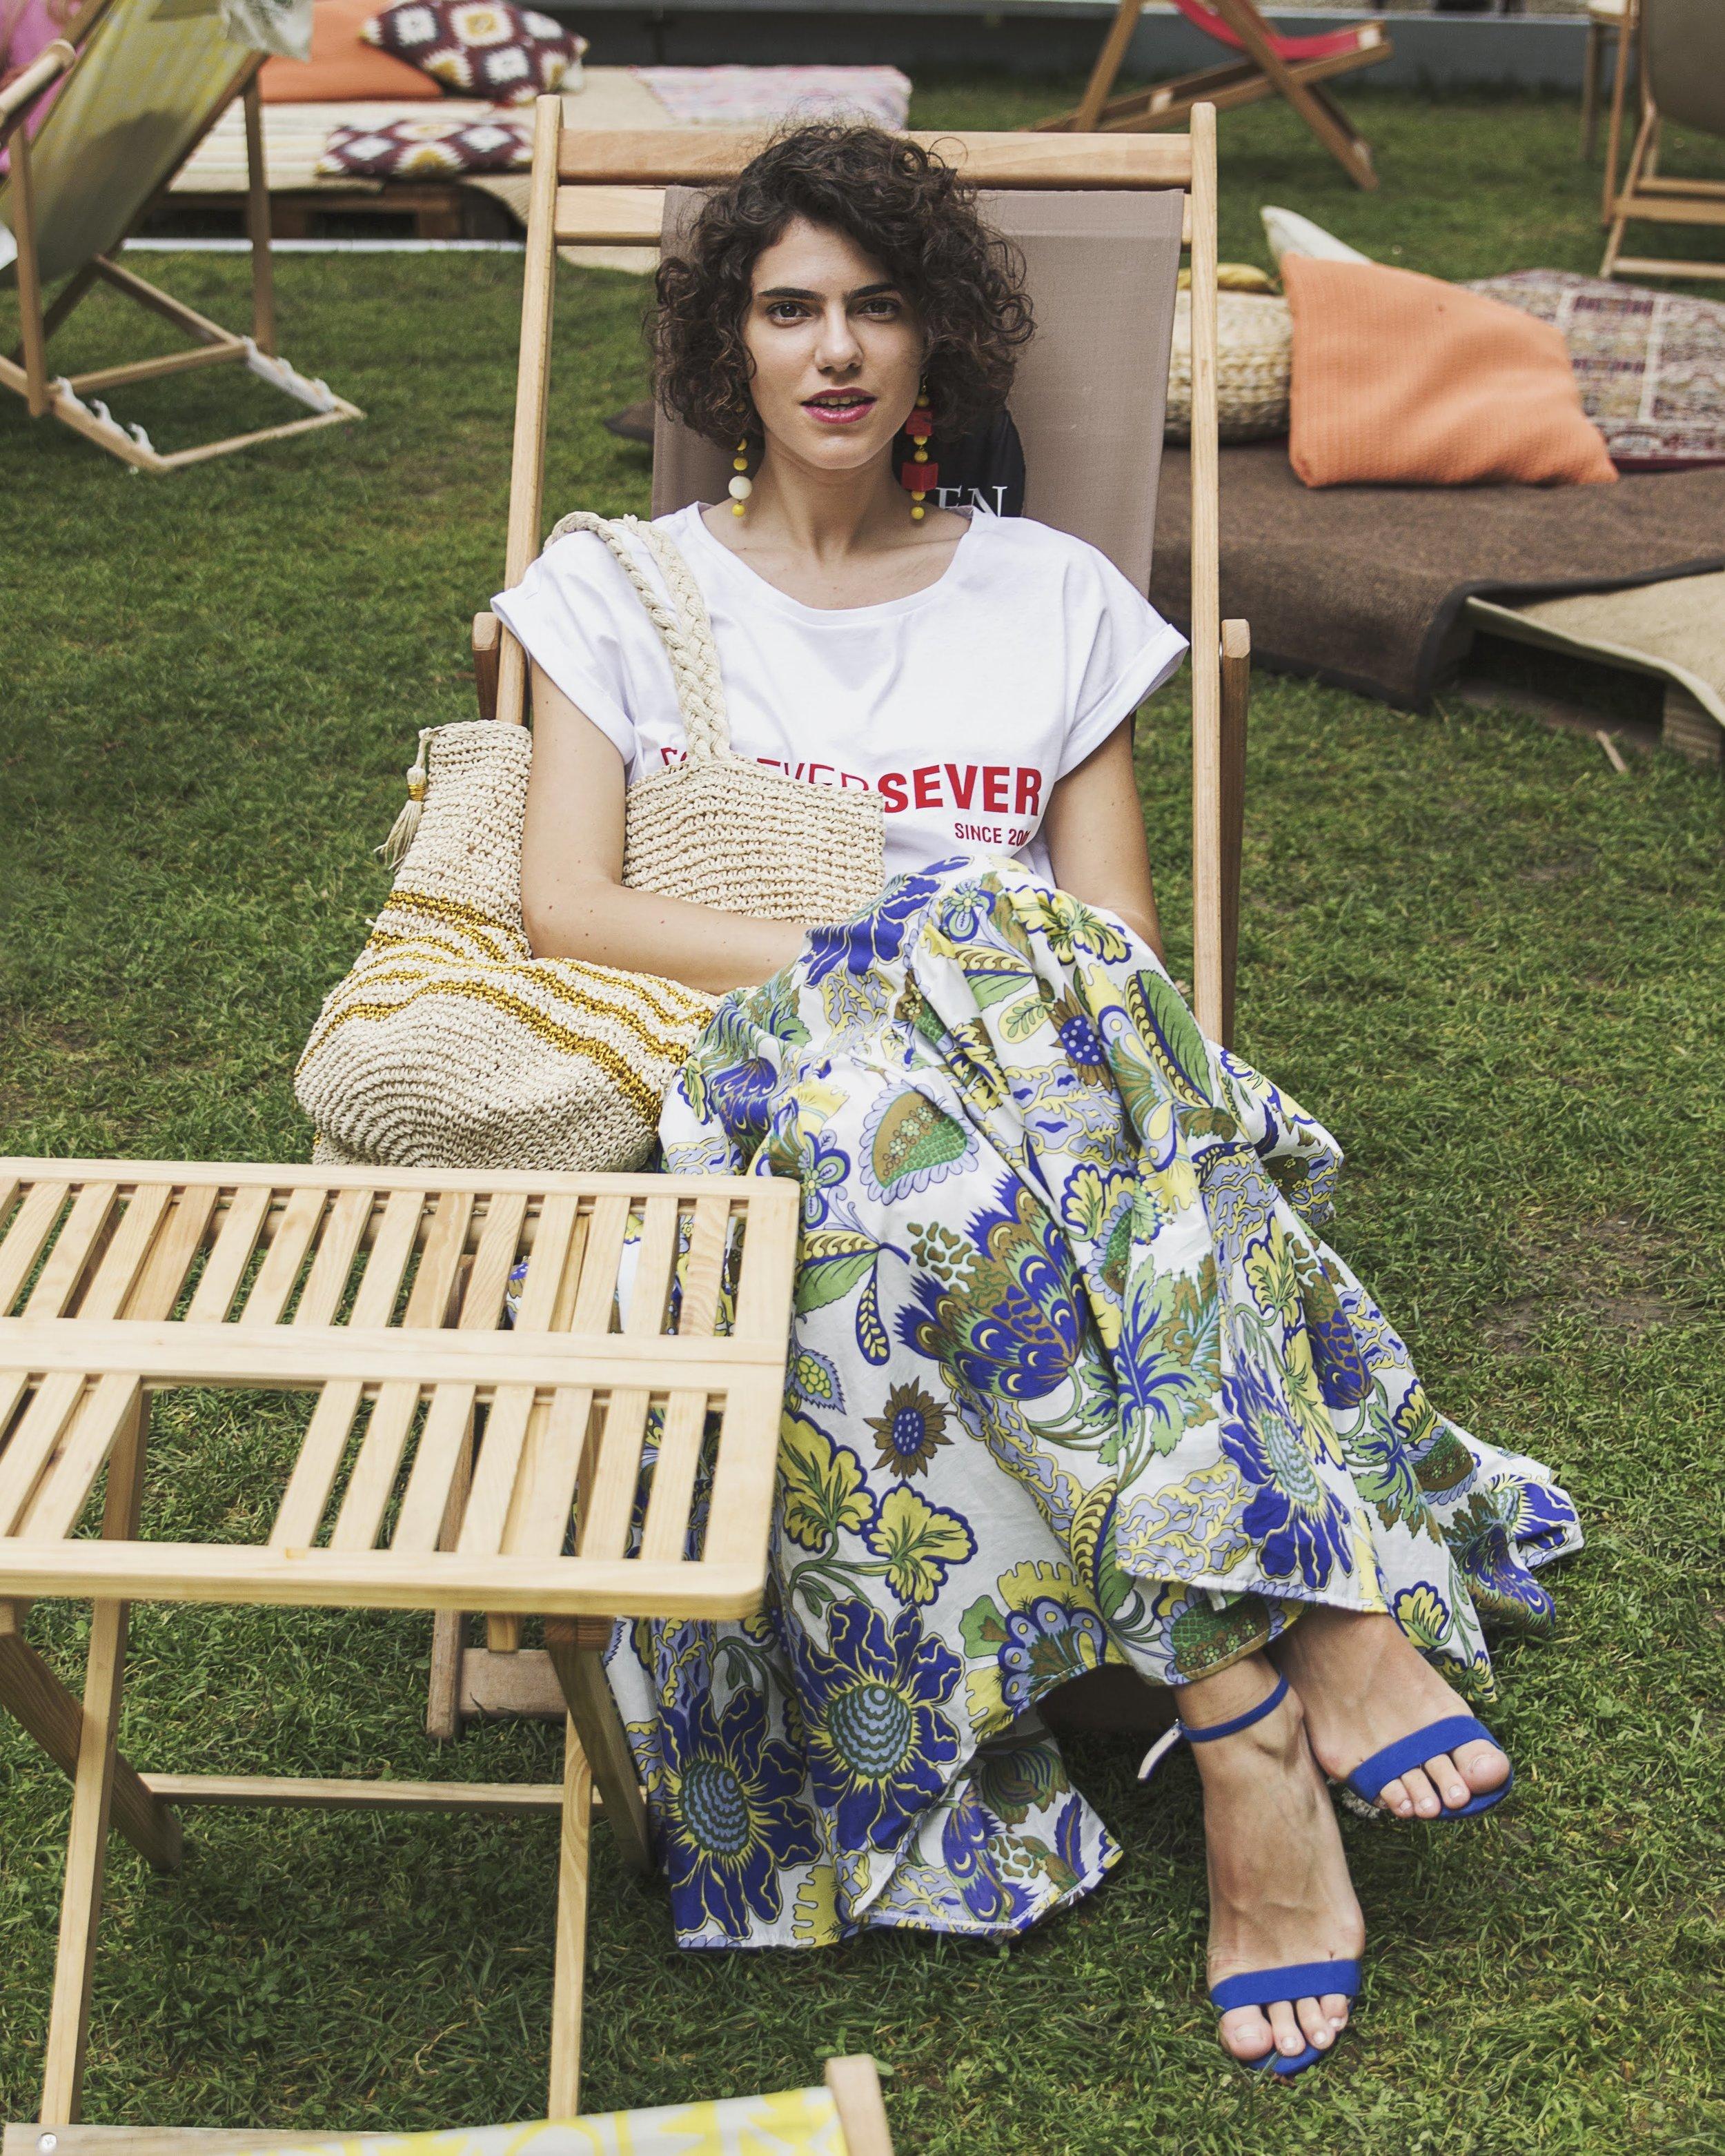 luka-lajic-fashion-photography-robert-sever-dizajner-croatian (1).jpg